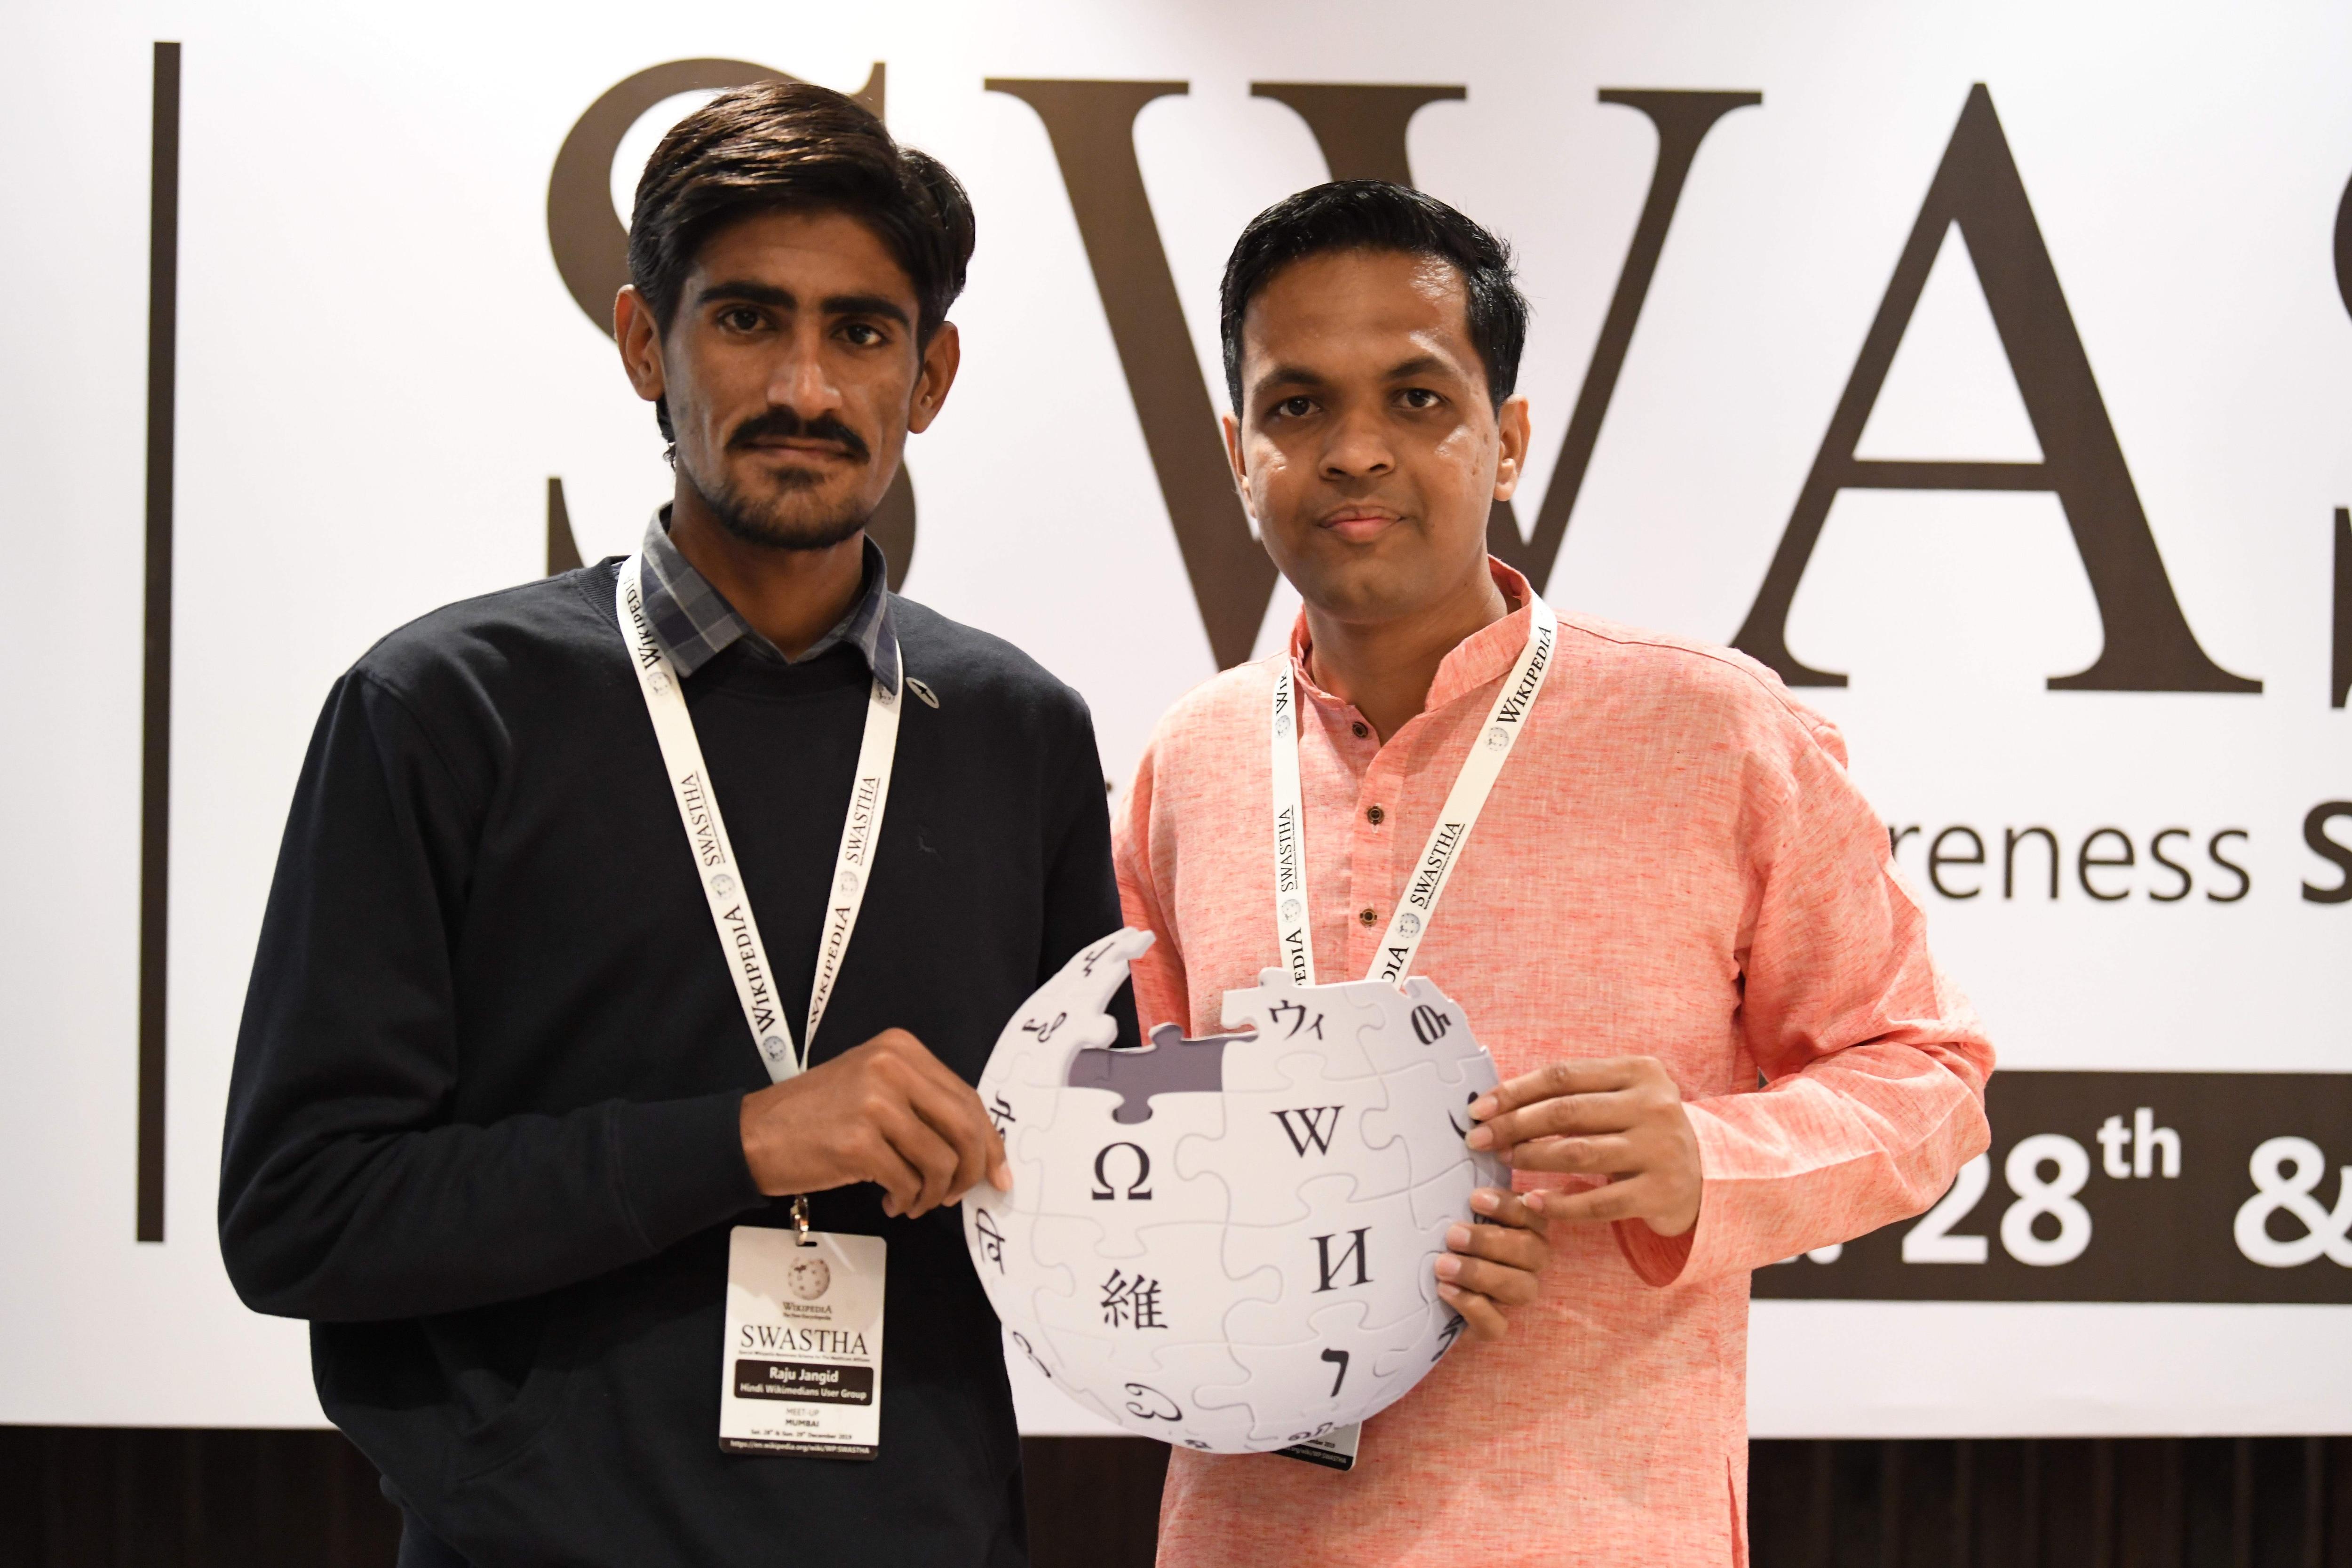 Hindi Wikipedia contributor